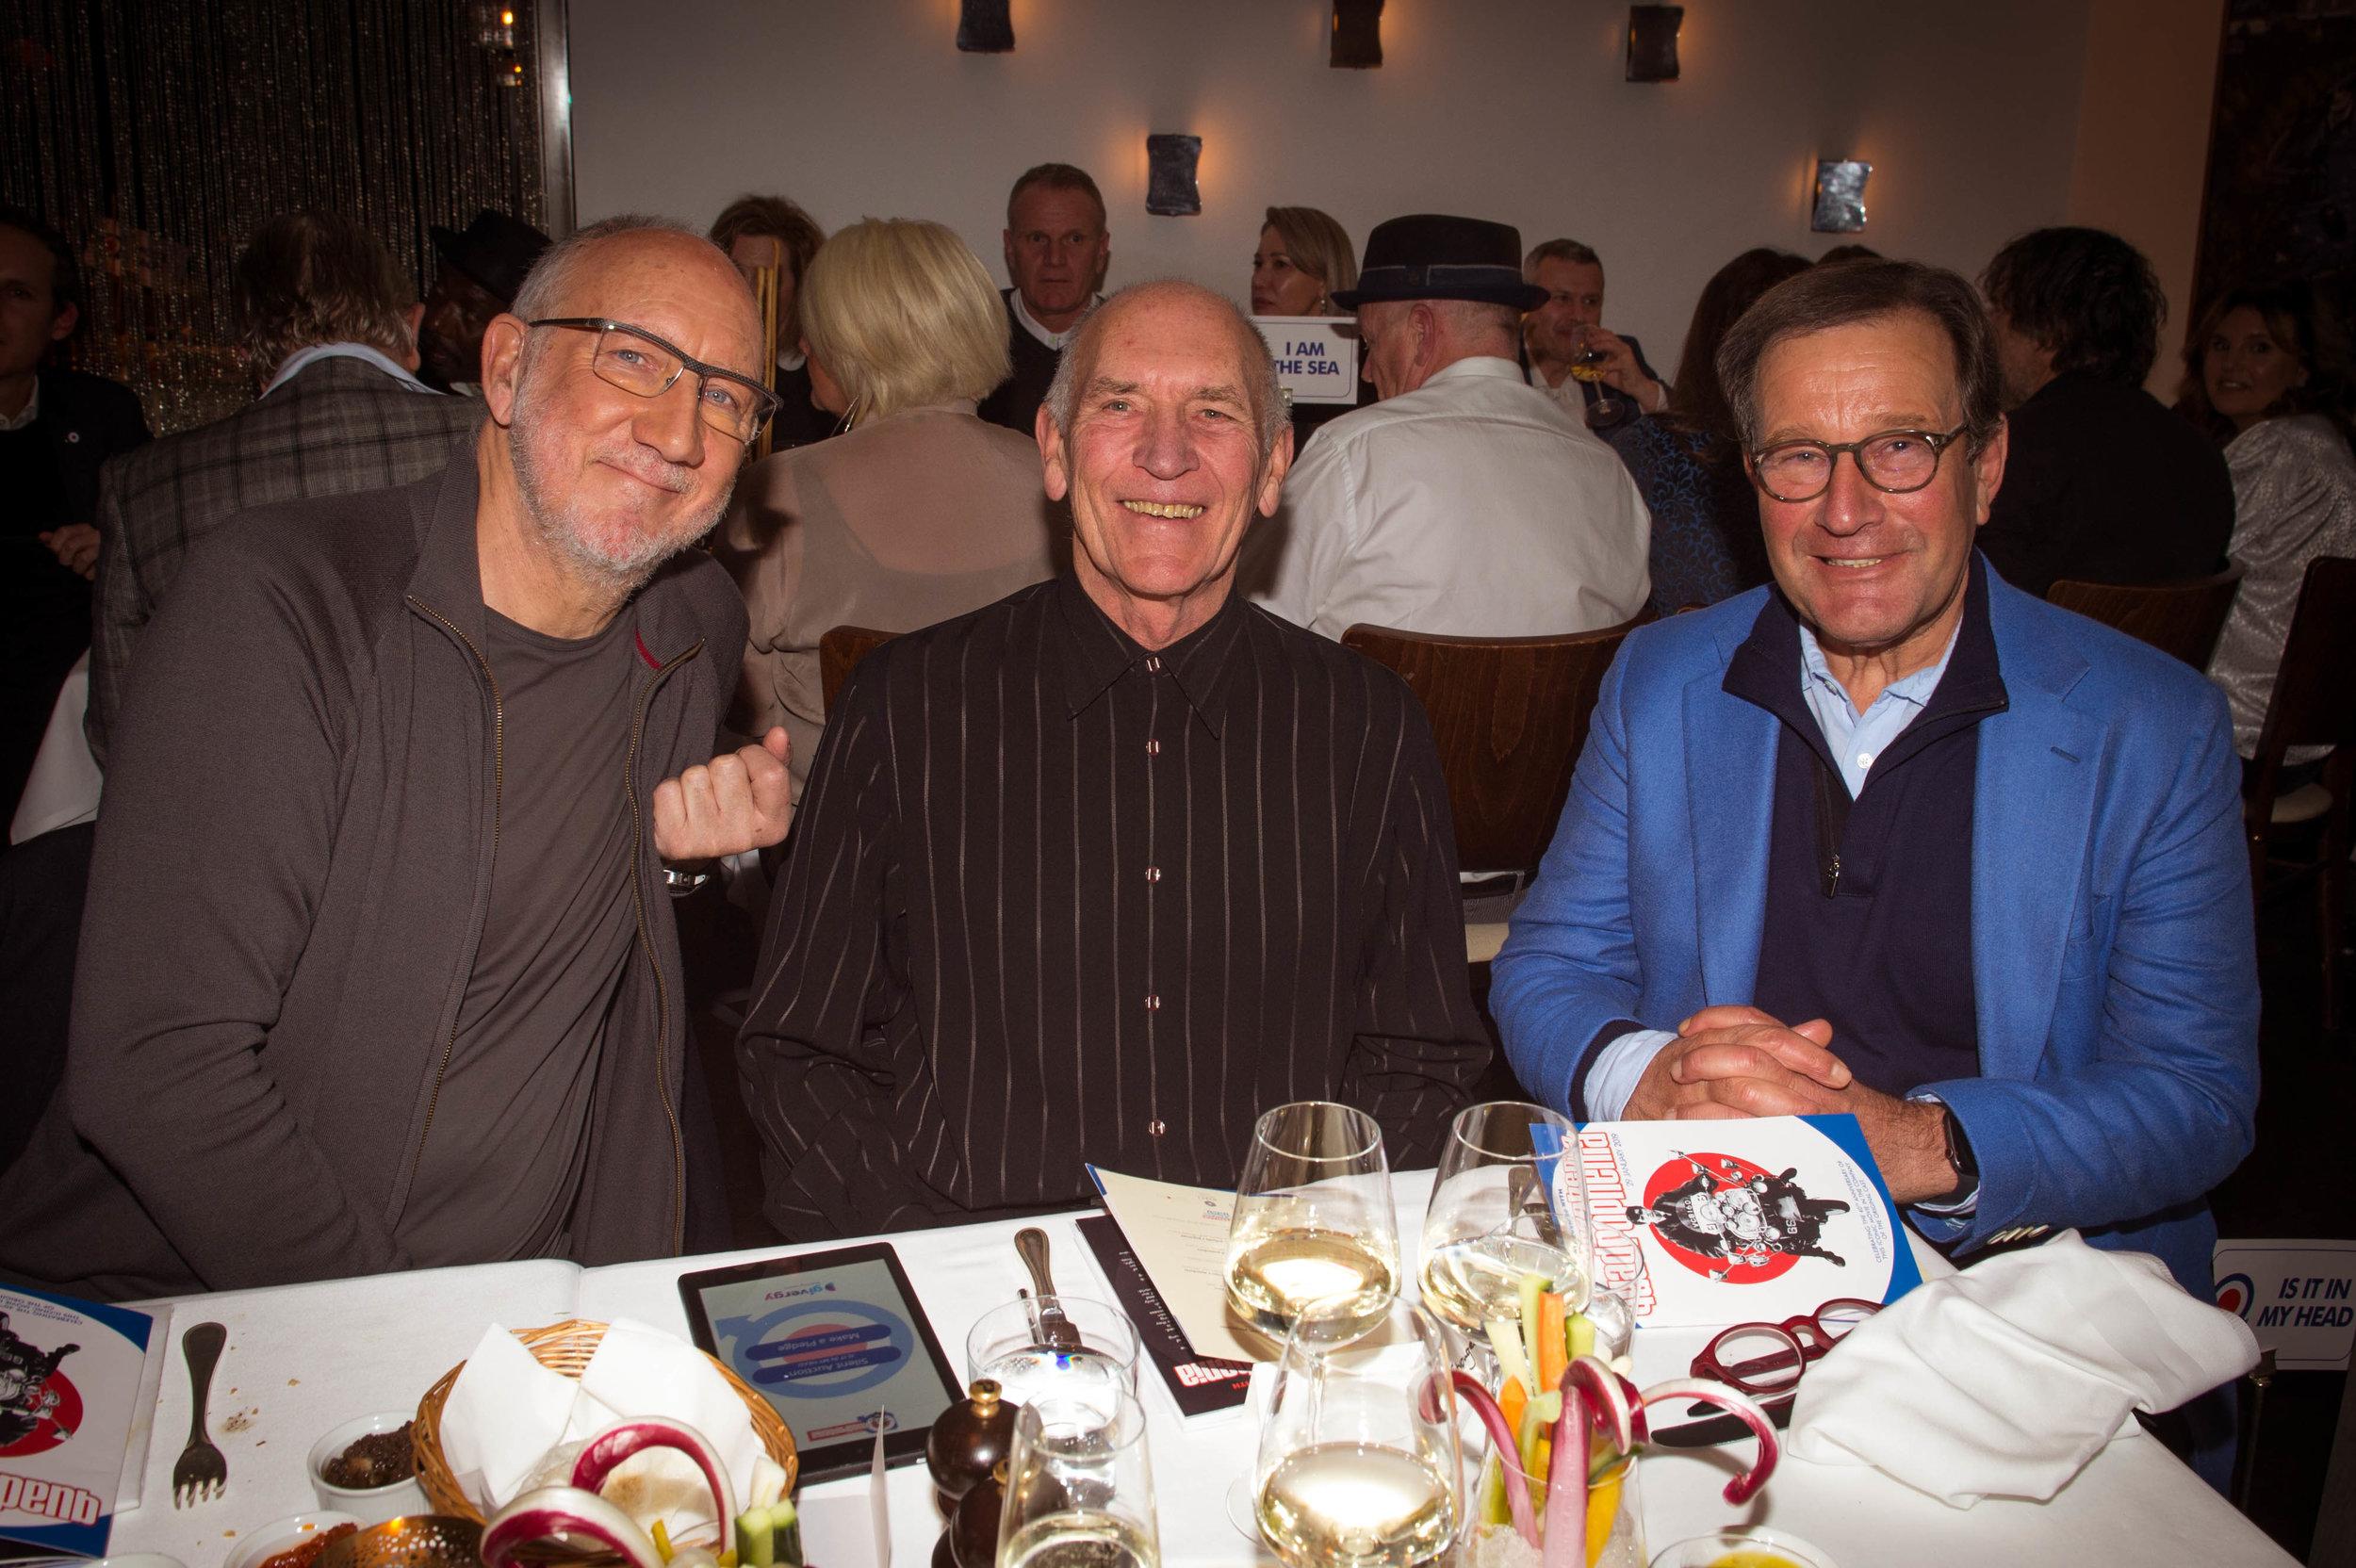 Pete Townshend, Bill Curbishley, Richard Desmond